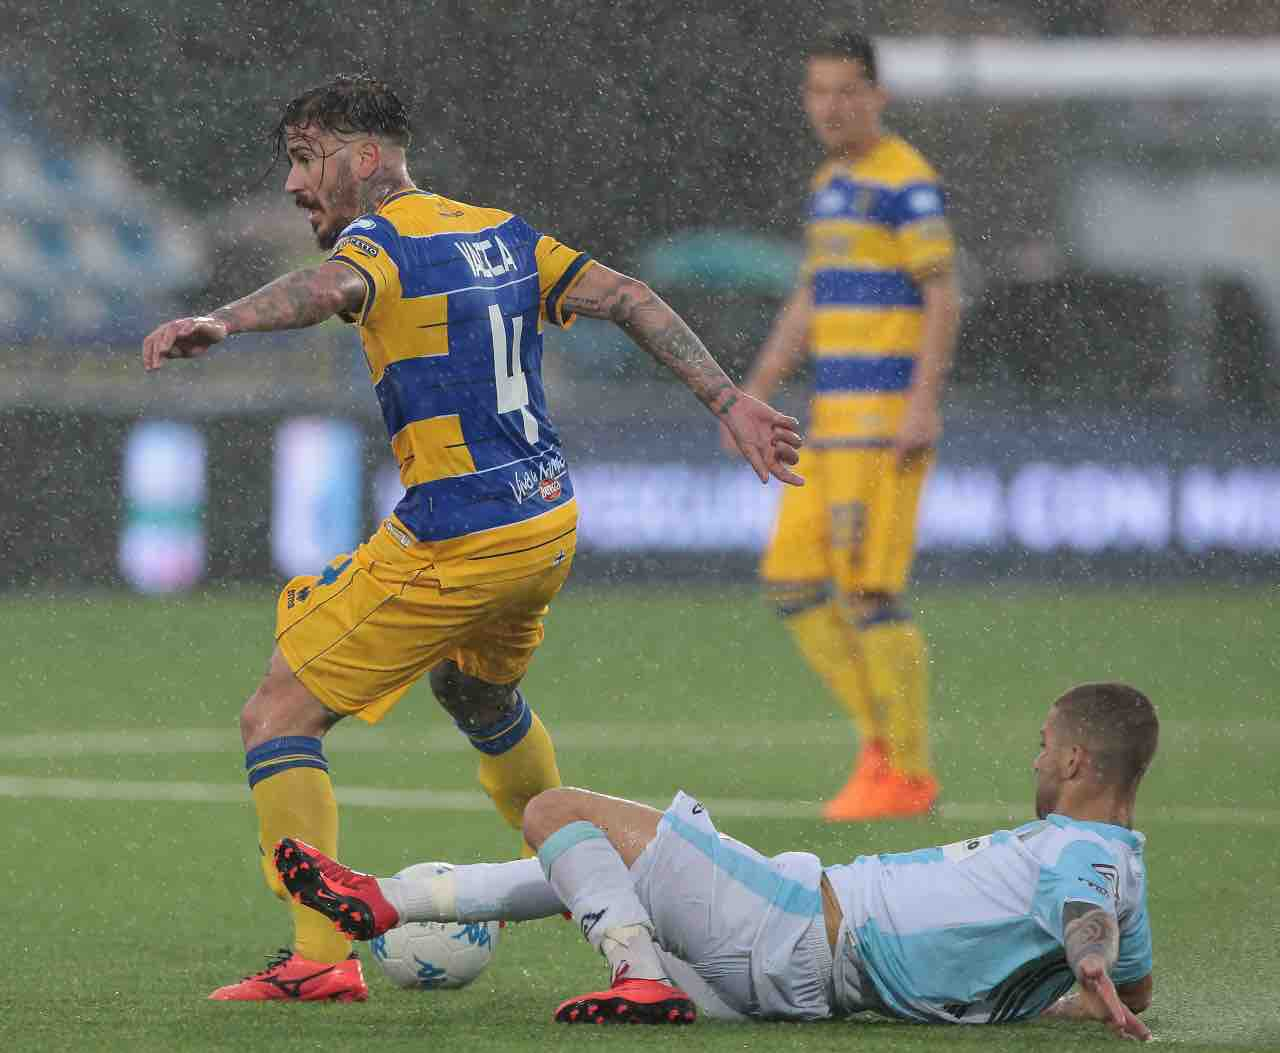 Calciomercato Entella De Luca Pordenone Frosinone Perugia Udinese Sampdoria Serie B